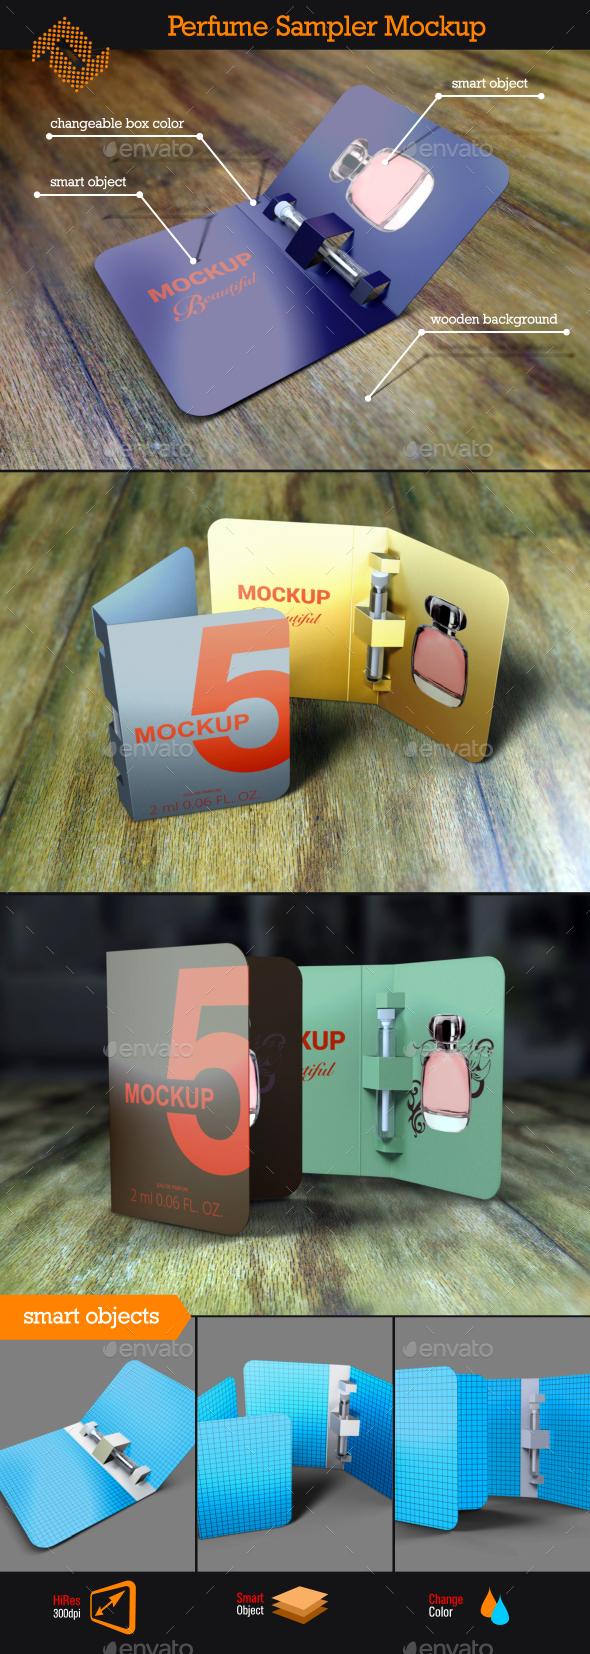 Perfume Sampler Mockup - Beauty Packaging